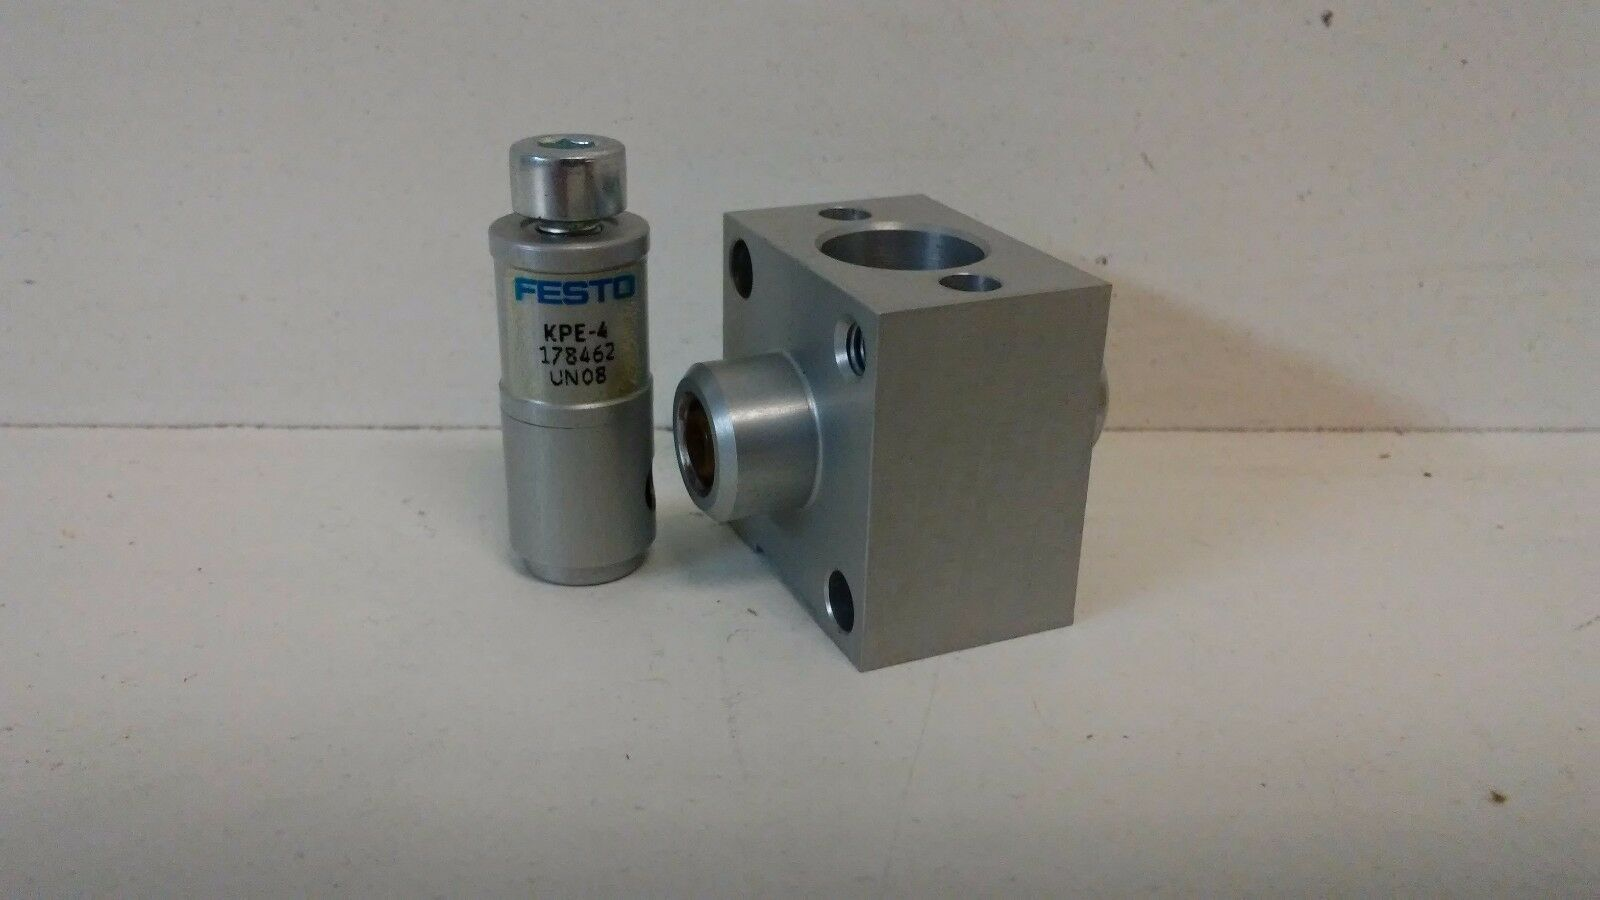 Old Stock Festo Clamping Cartridge Kp 4 80 Kpe 178462 Un08 Ebay Arc Fault Circuit Breaker Qo120cafic Noninterchangable Norton Secured Powered By Verisign